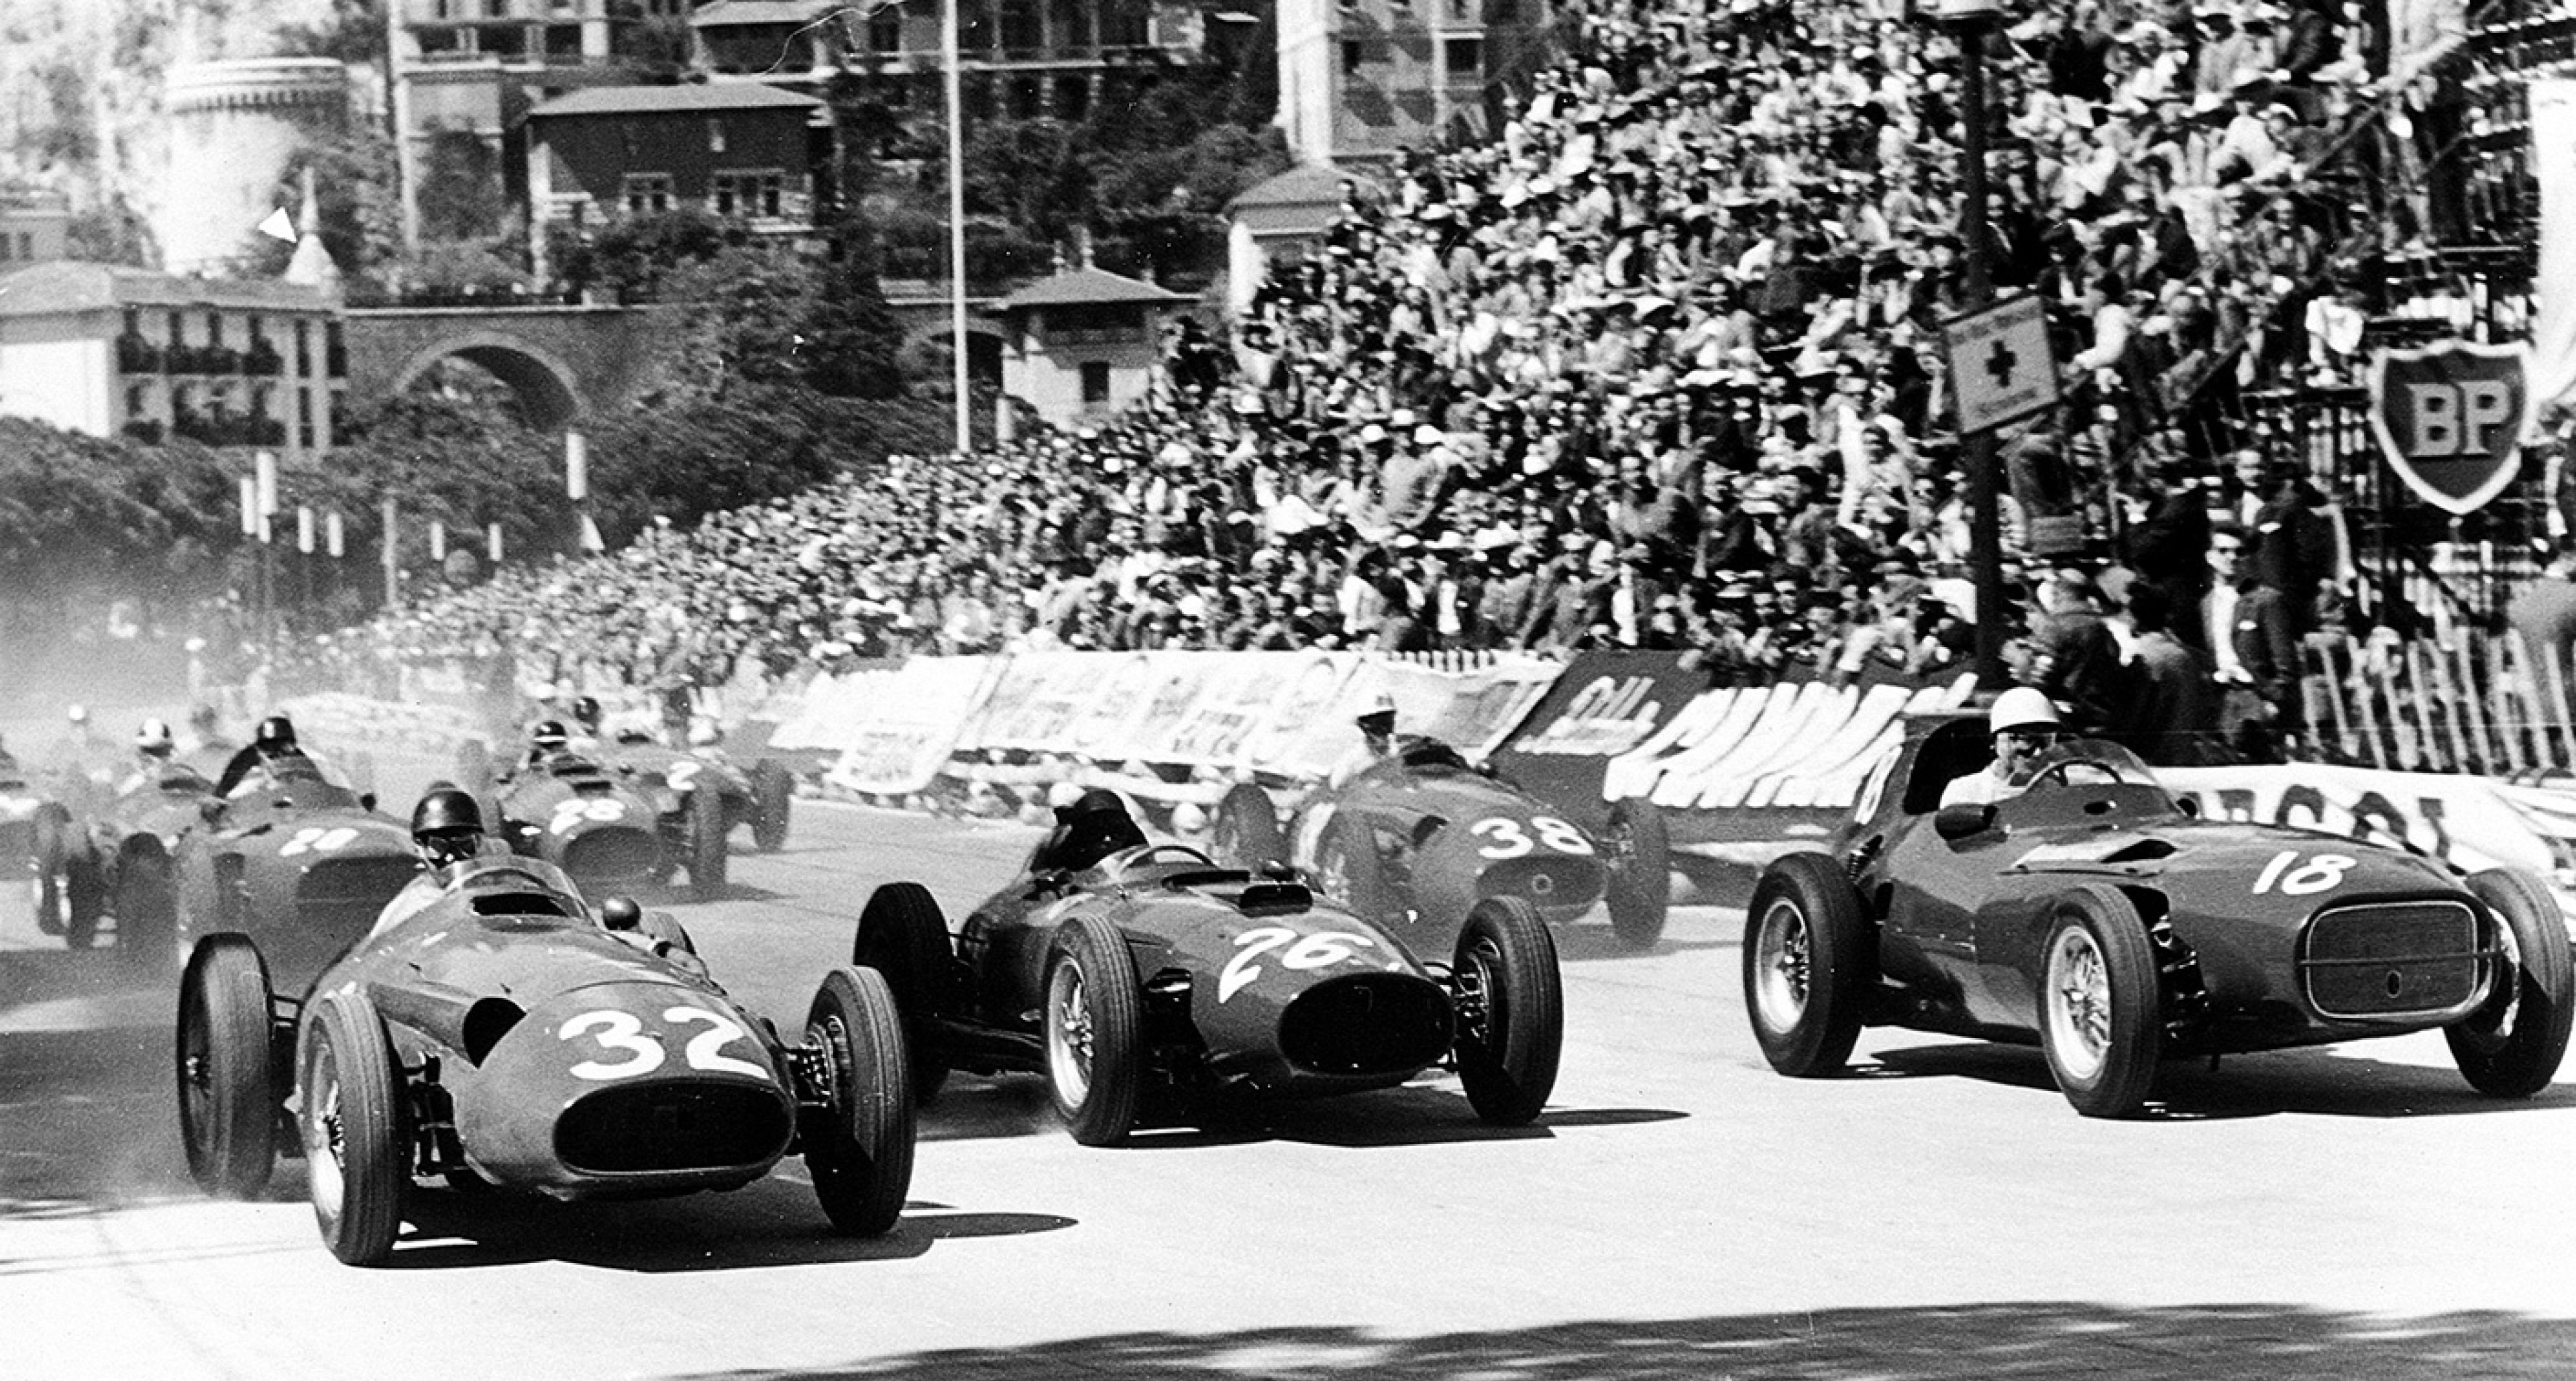 Fangio (Maserati, #32) battles with Collins (Ferrari, #26) and Moss (Vanwall, #18)